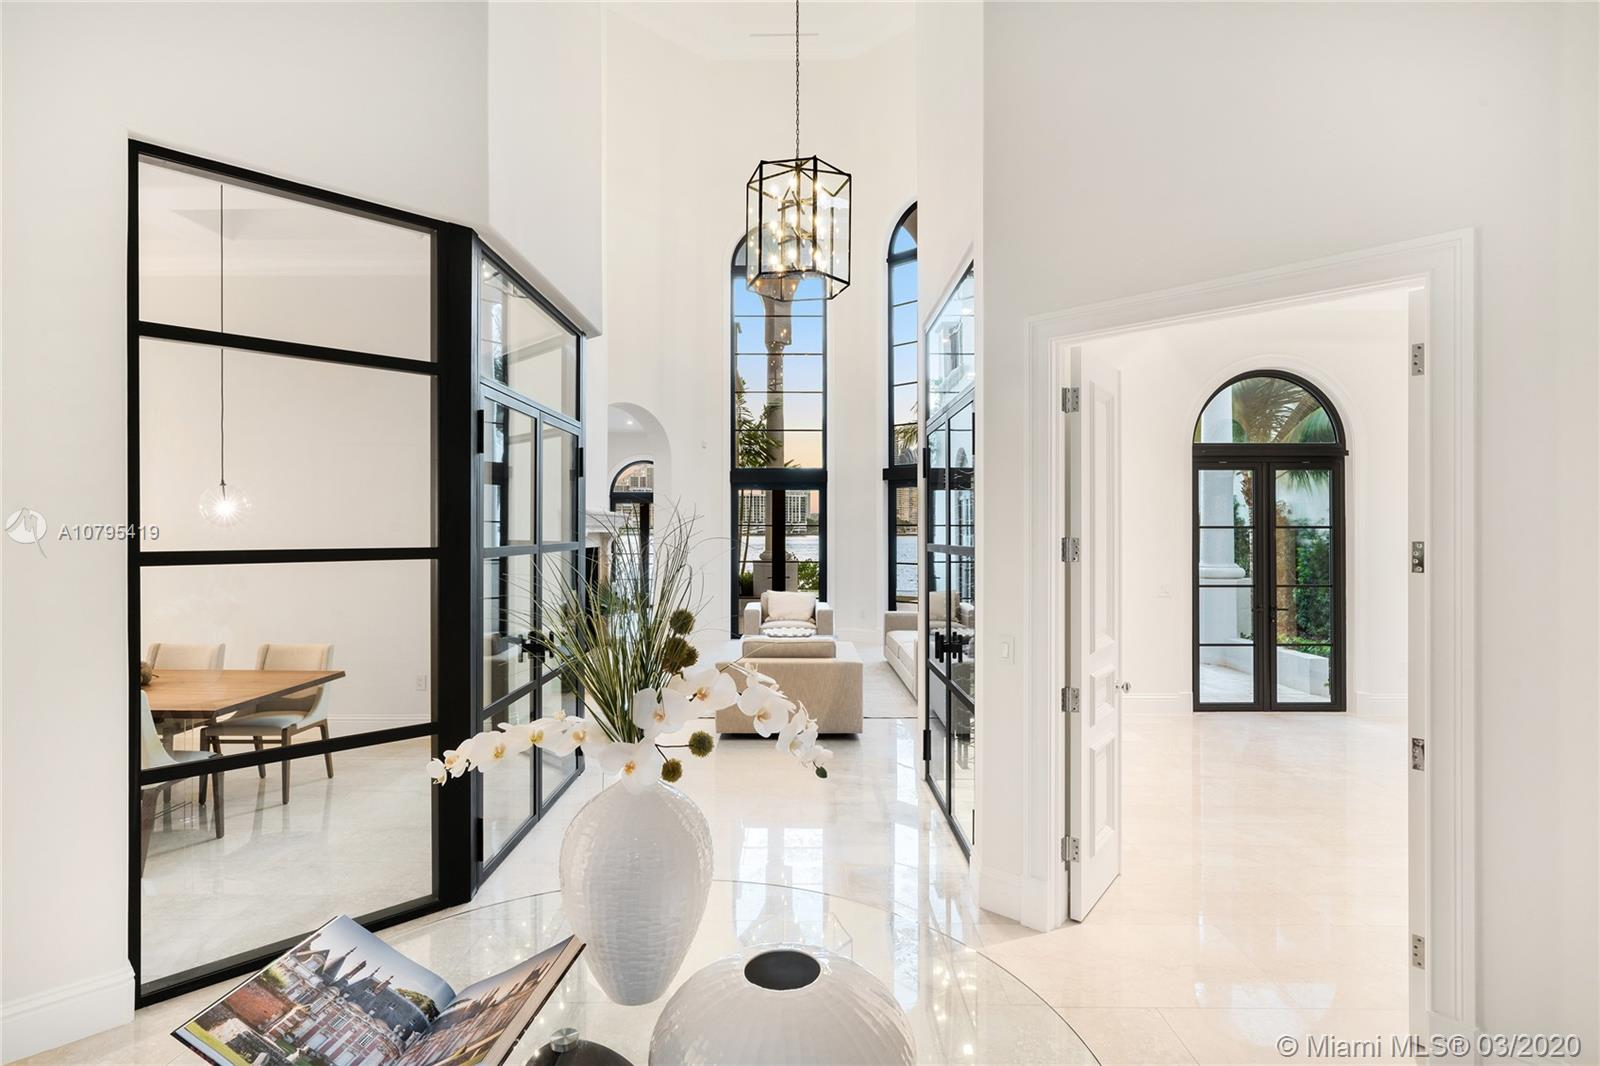 4032 Island Estates Dr, Aventura, FL 33160 - Aventura, FL real estate listing